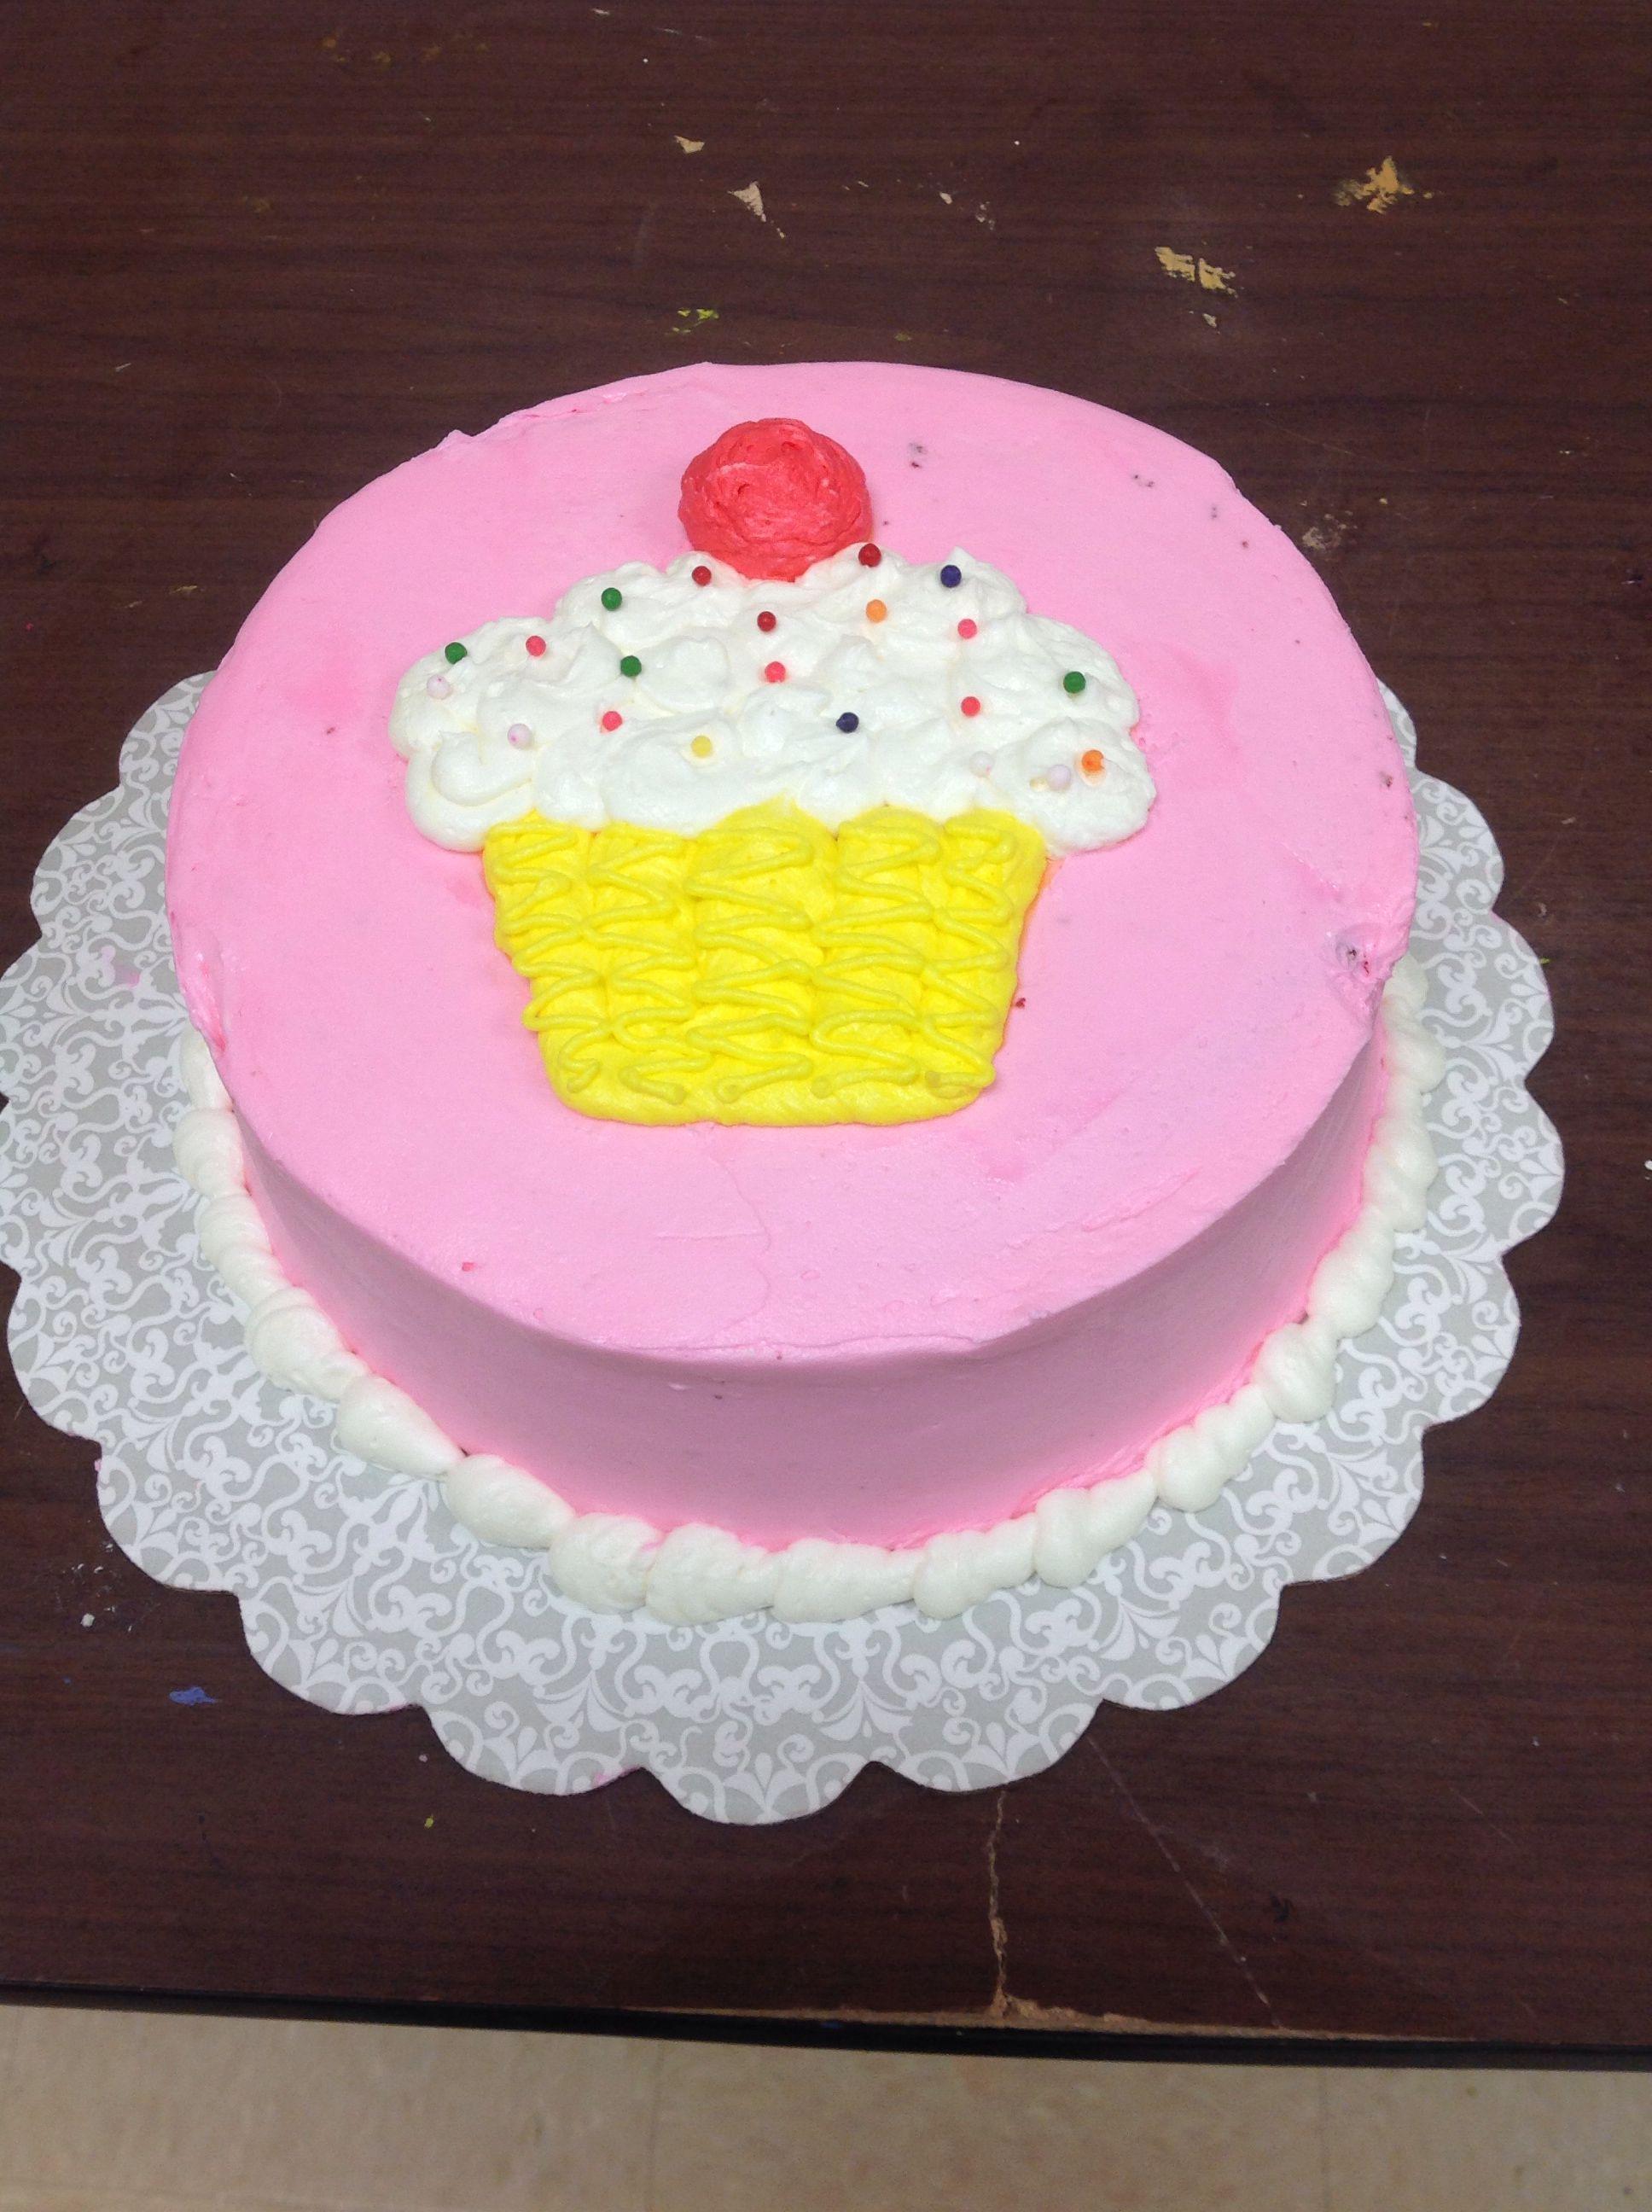 Linda Luu Made A Beautiful Cake In Course 1 Decorating Basics At